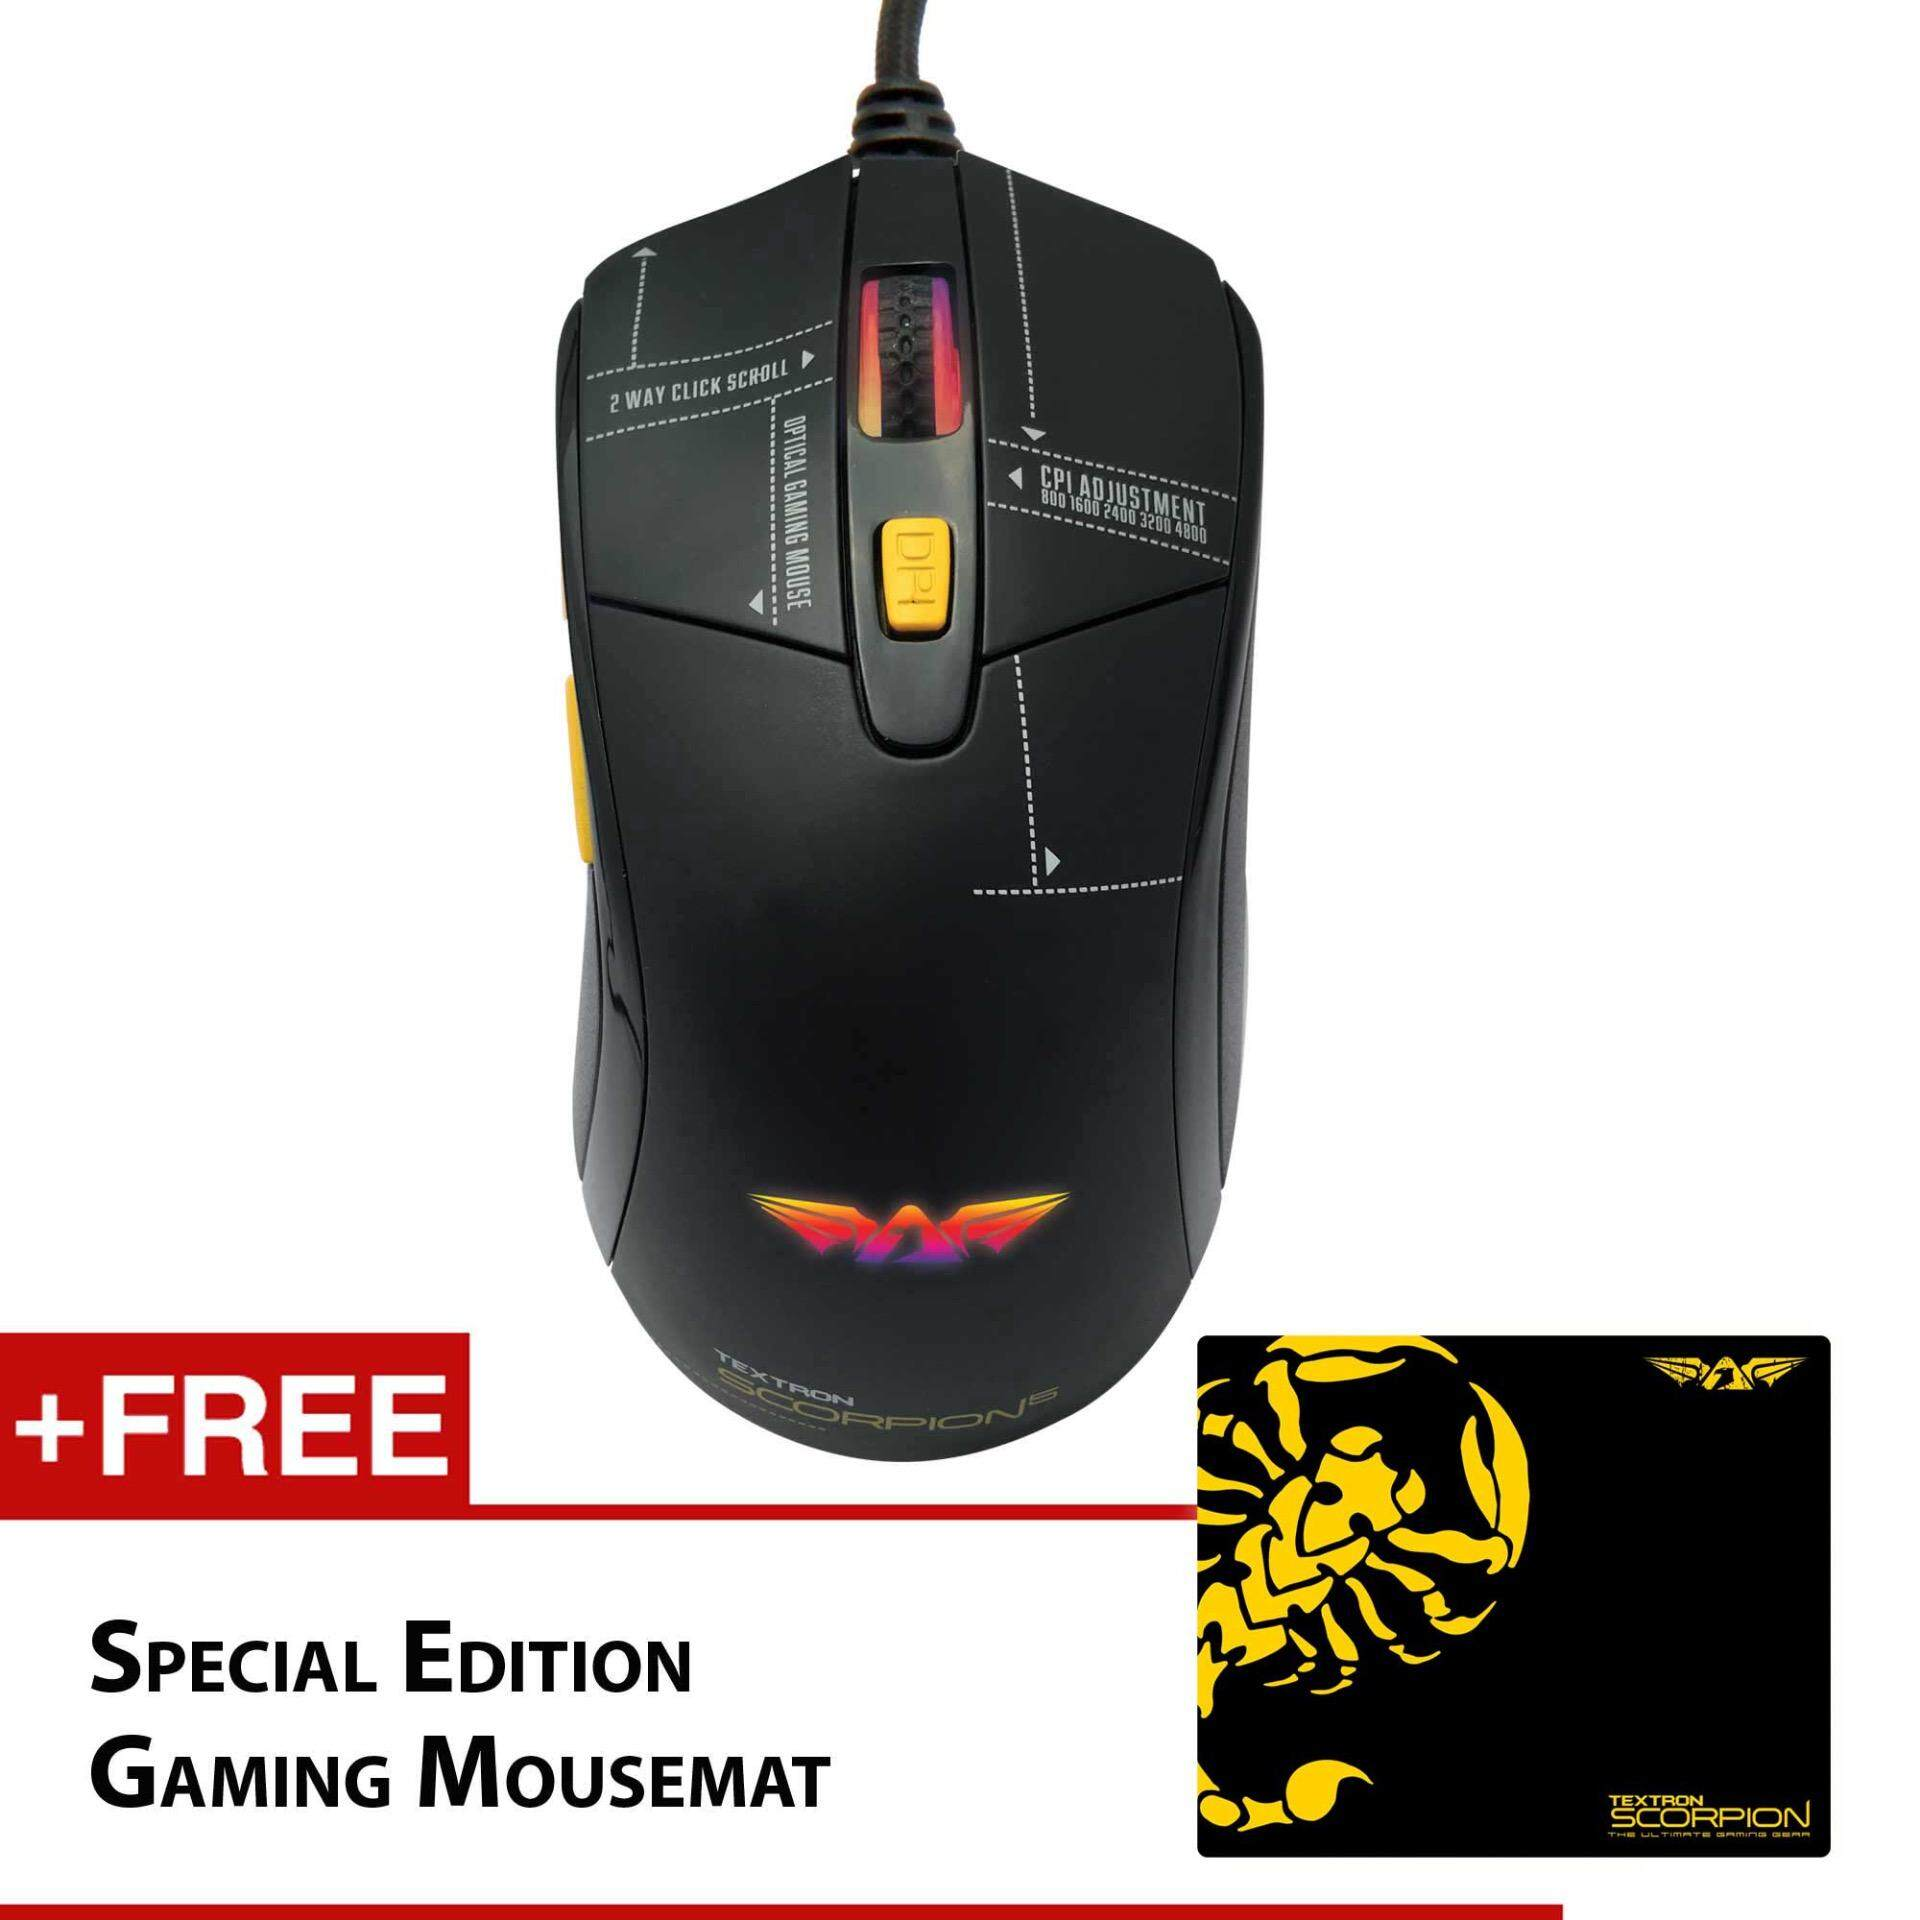 Armaggeddon Scorpion 5 Gaming Mouse 4800CPI (Free Gaming Mousemat) Malaysia